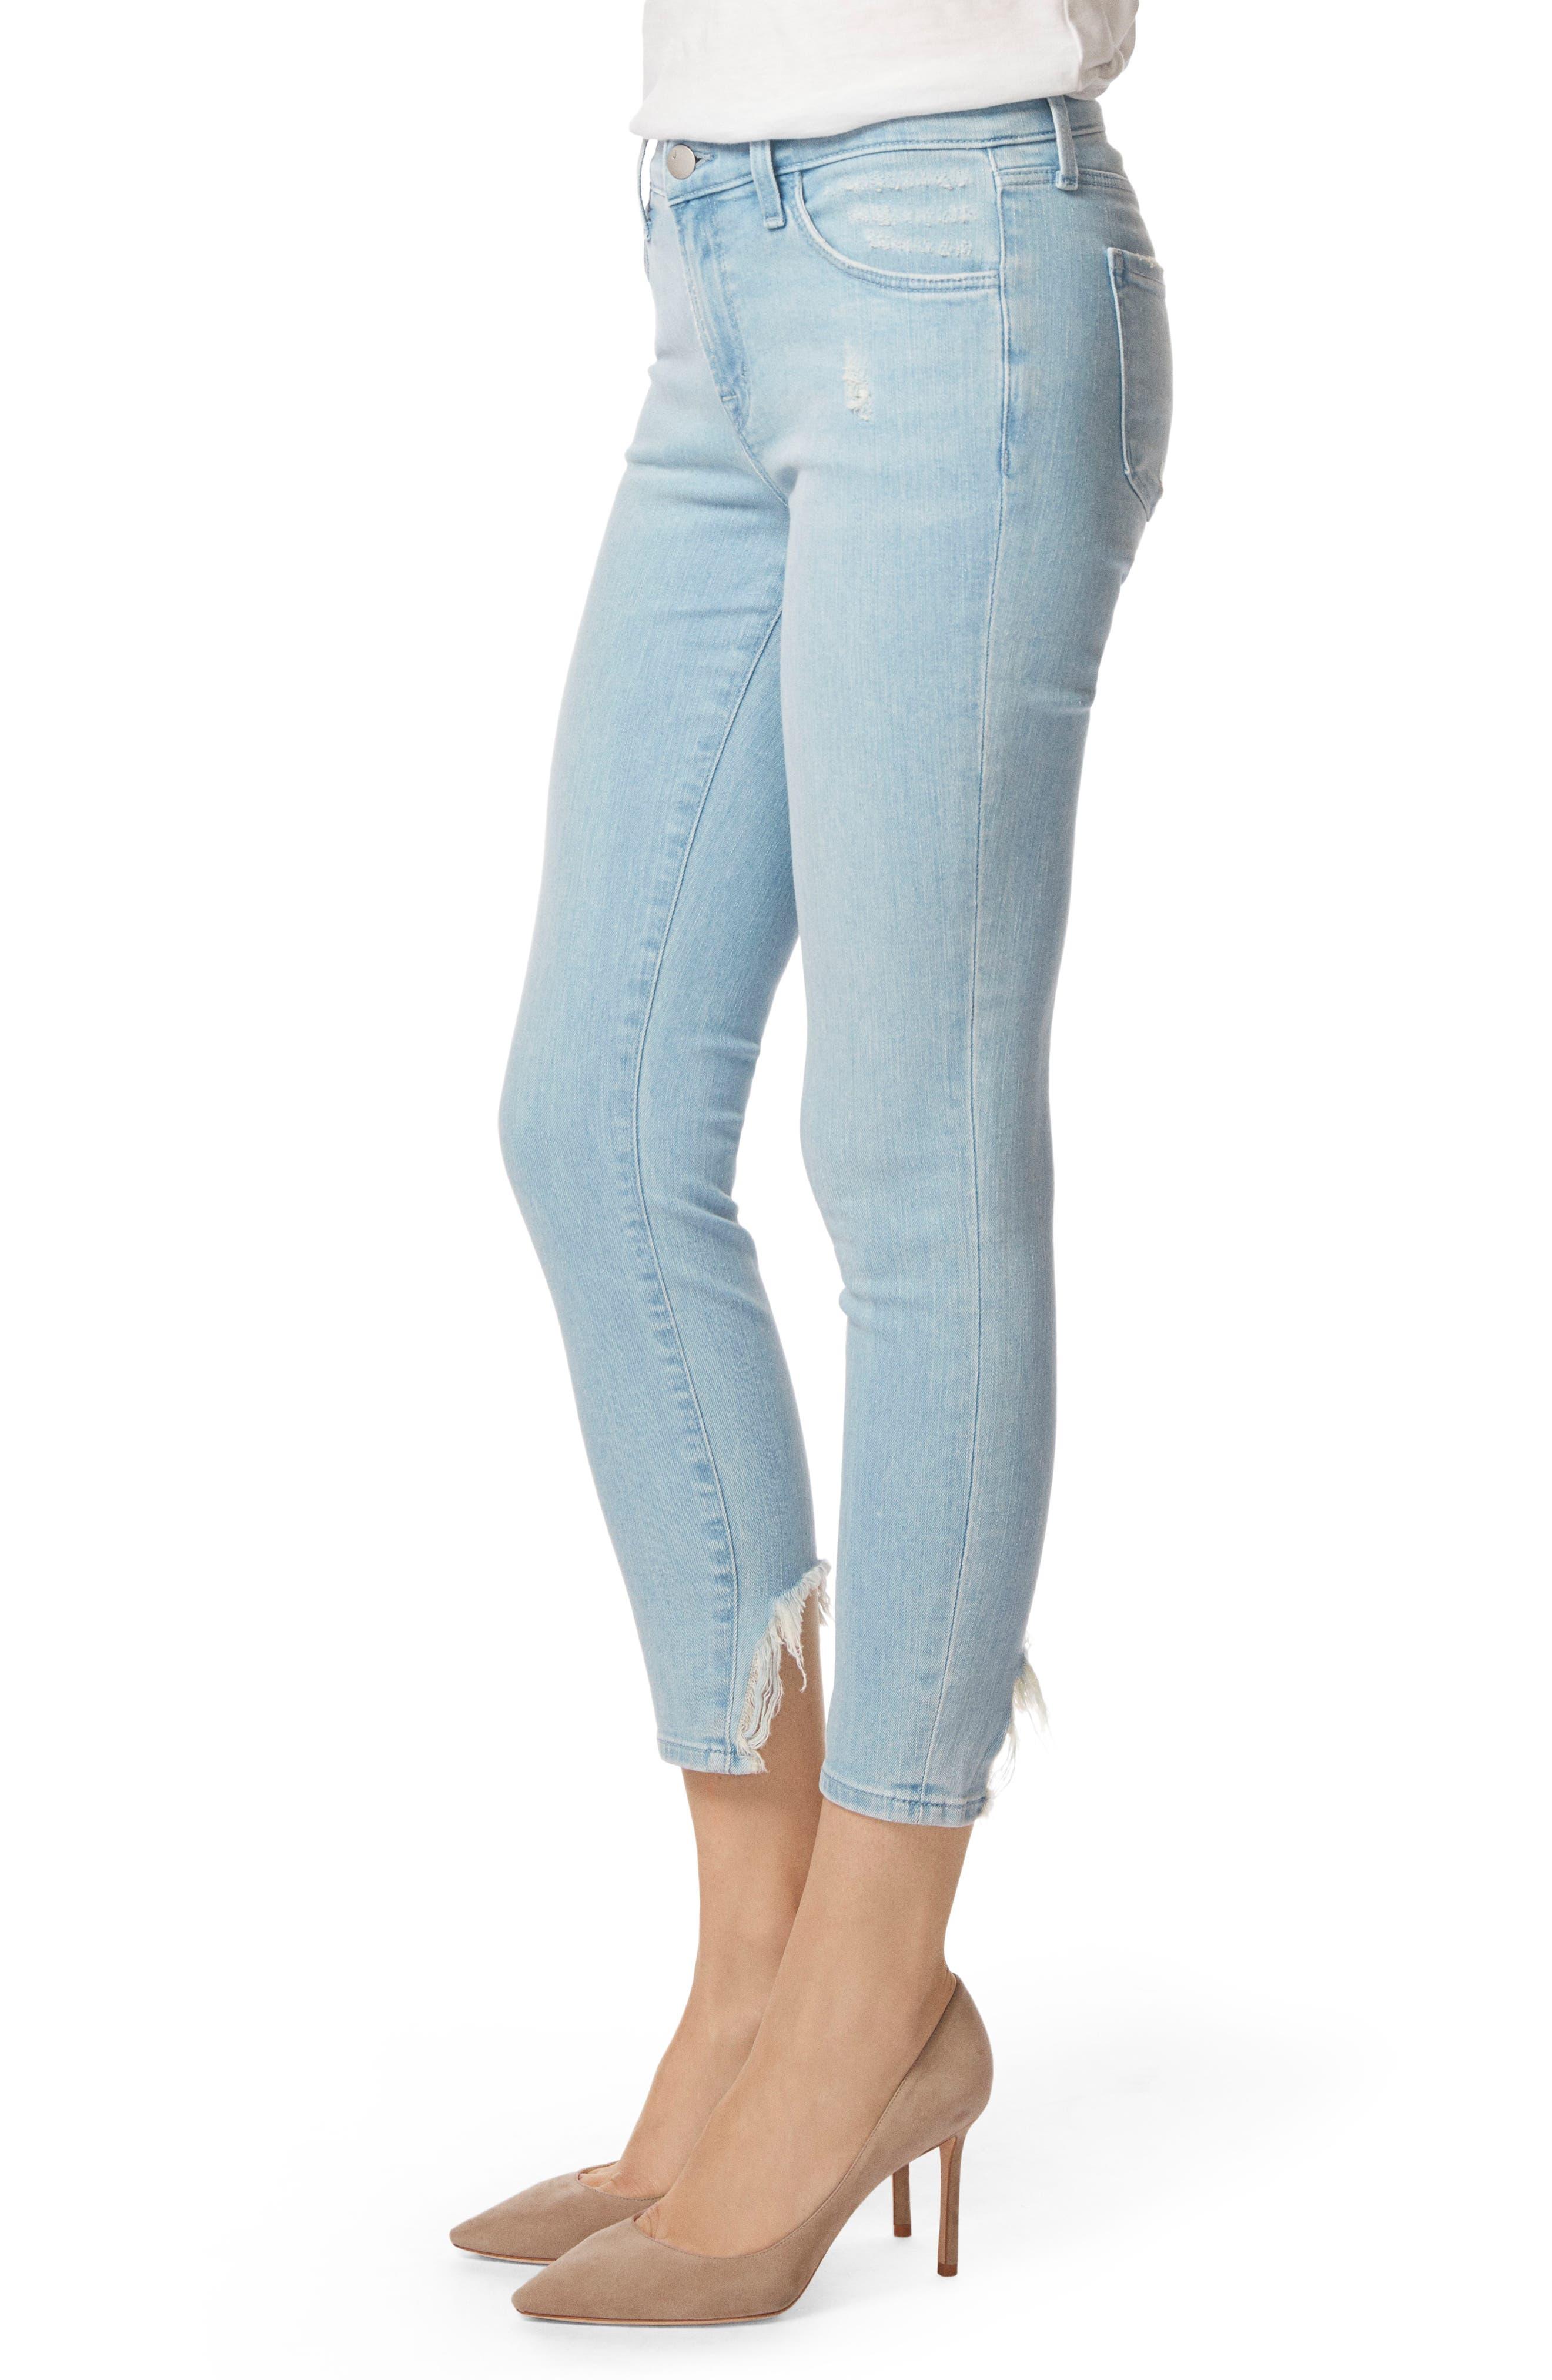 835 Capri Skinny Jeans,                             Alternate thumbnail 3, color,                             454